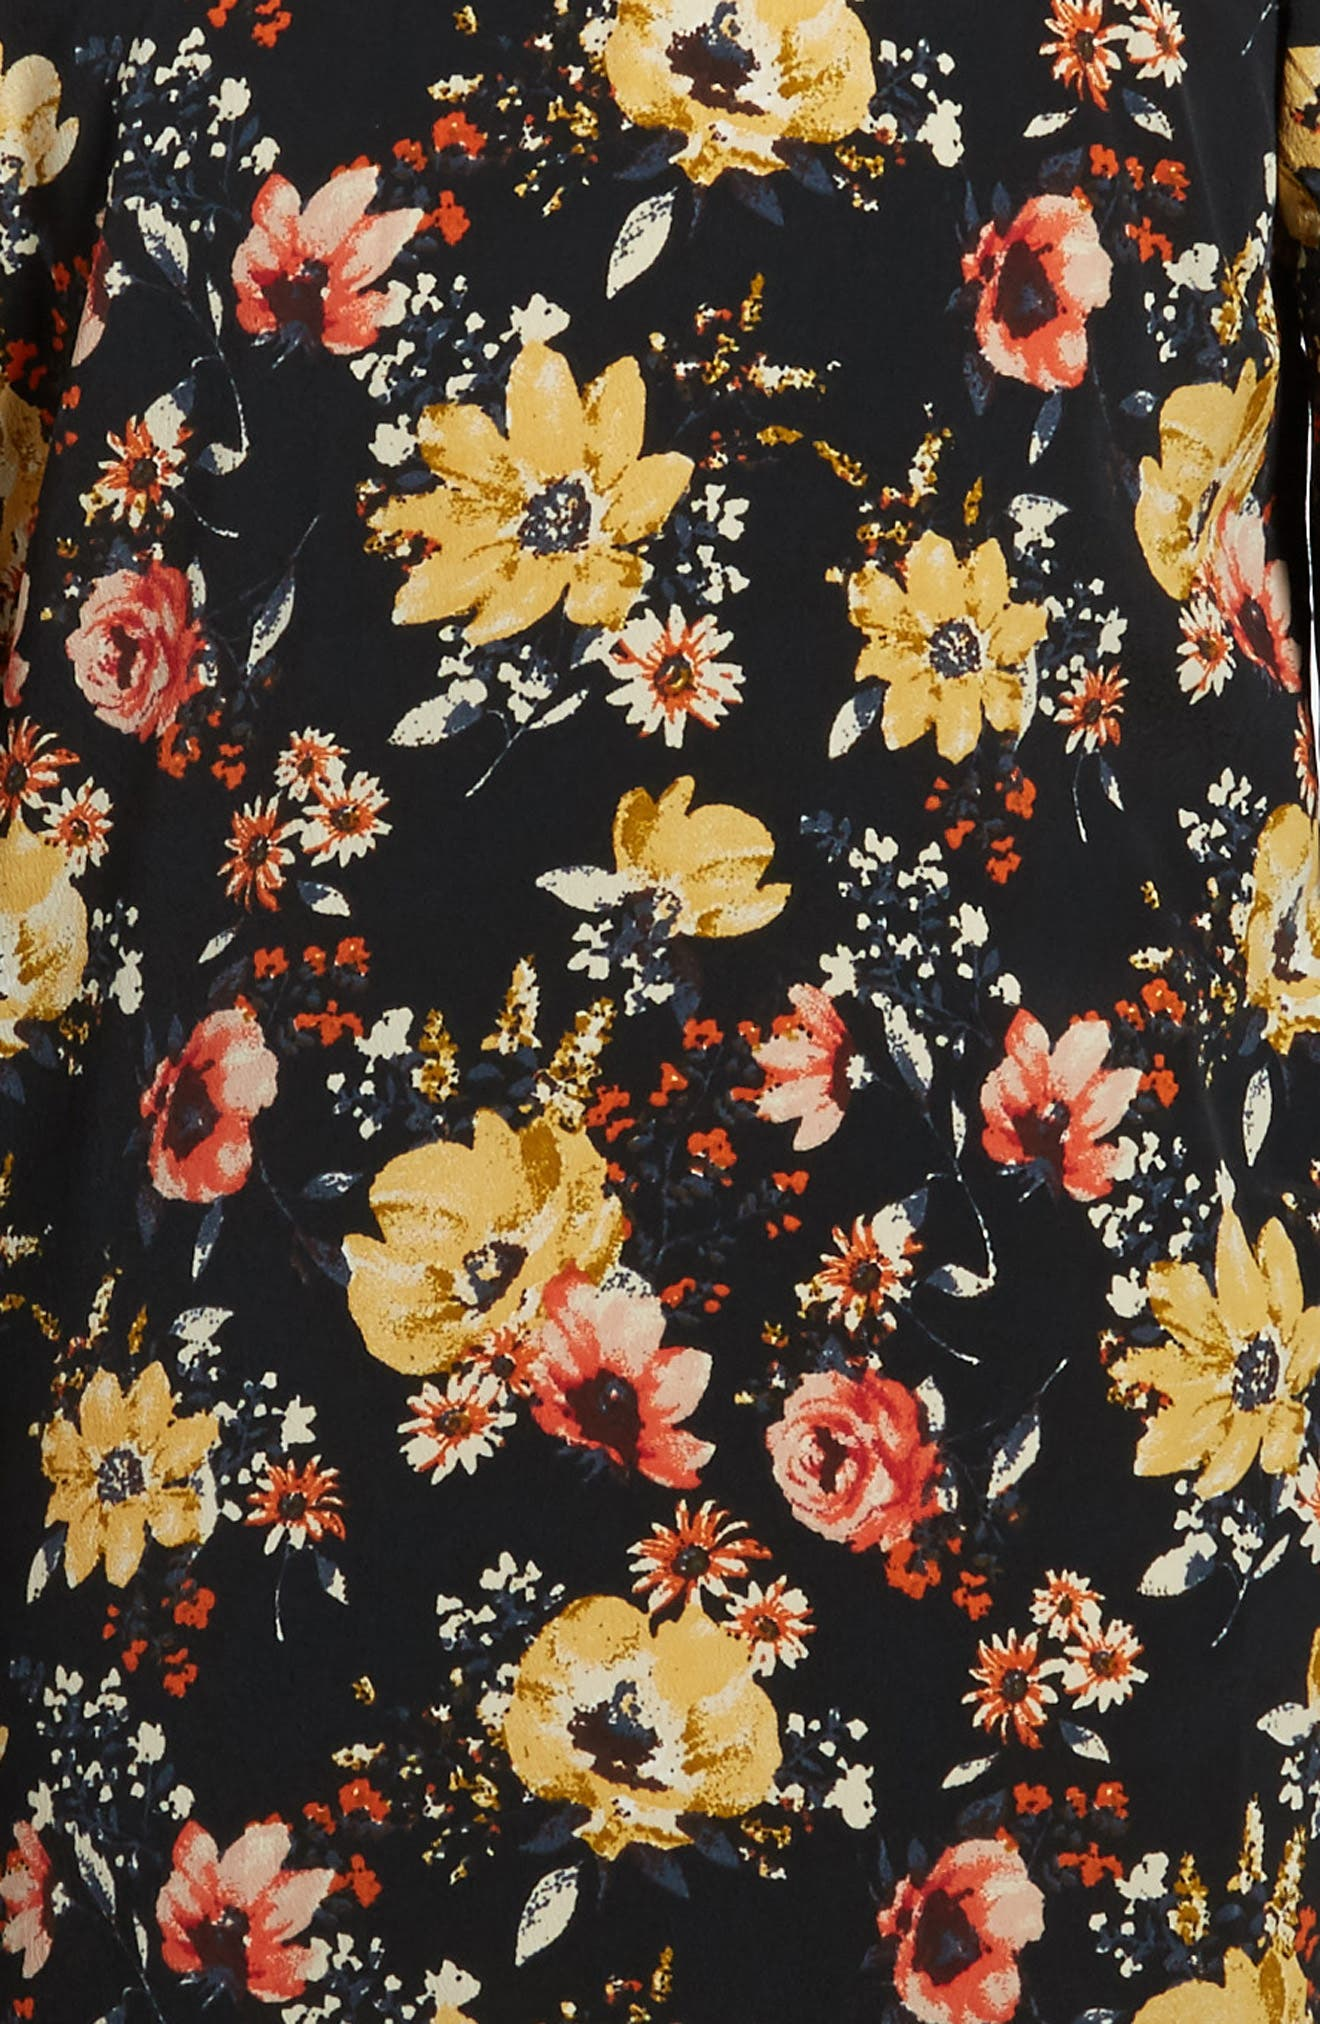 Floral Print Cold Shoulder Dress,                             Alternate thumbnail 3, color,